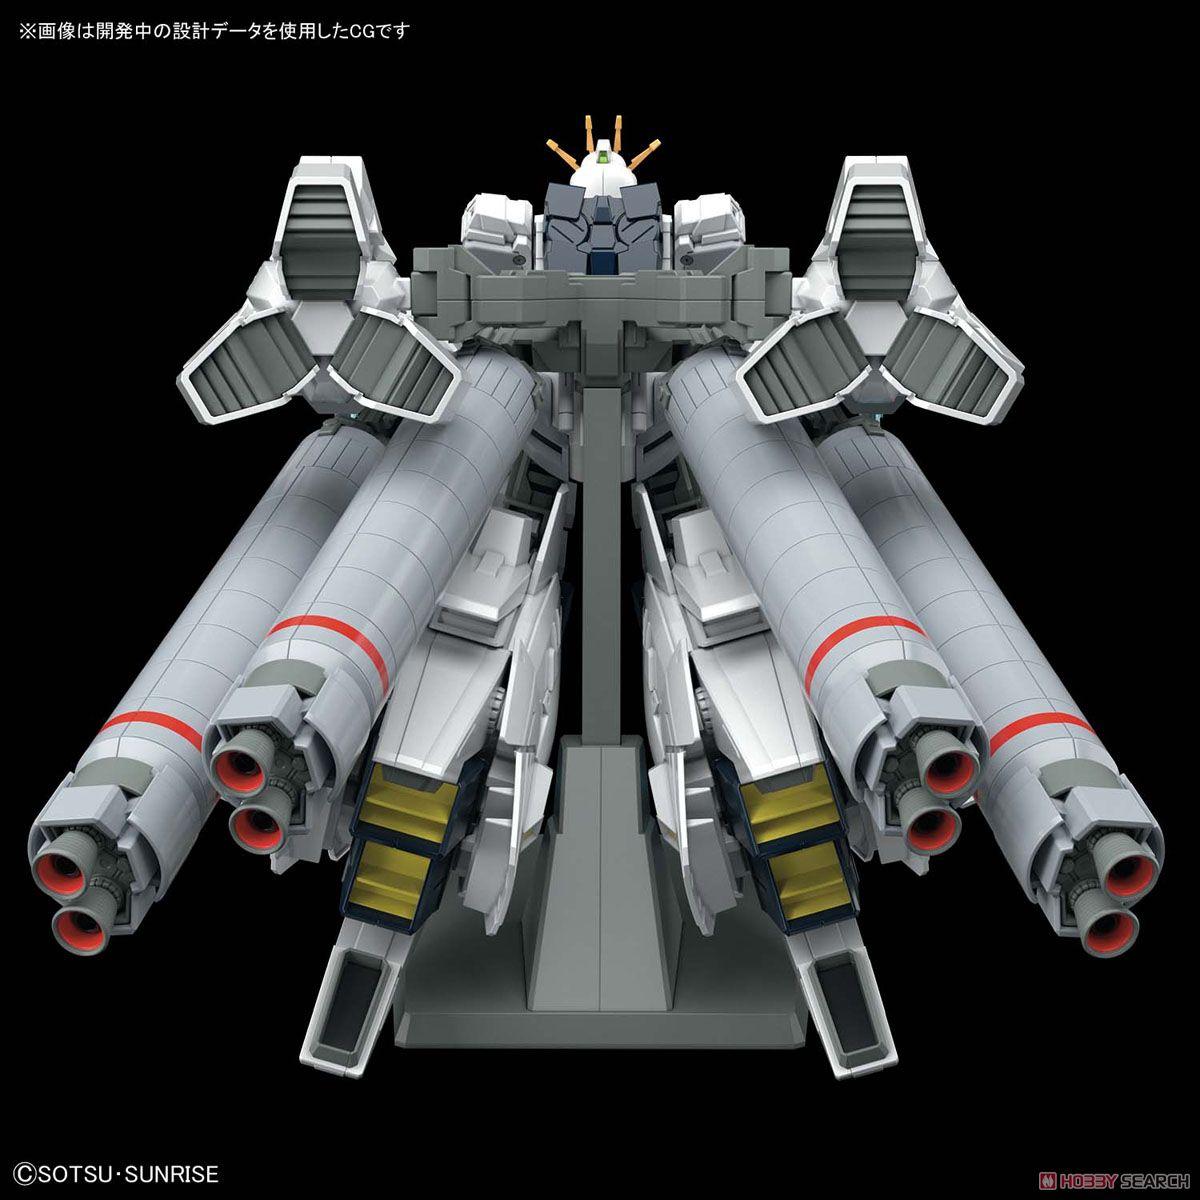 HGUC『ナラティブガンダム A装備』ガンダムNT 1/144 プラモデル-013